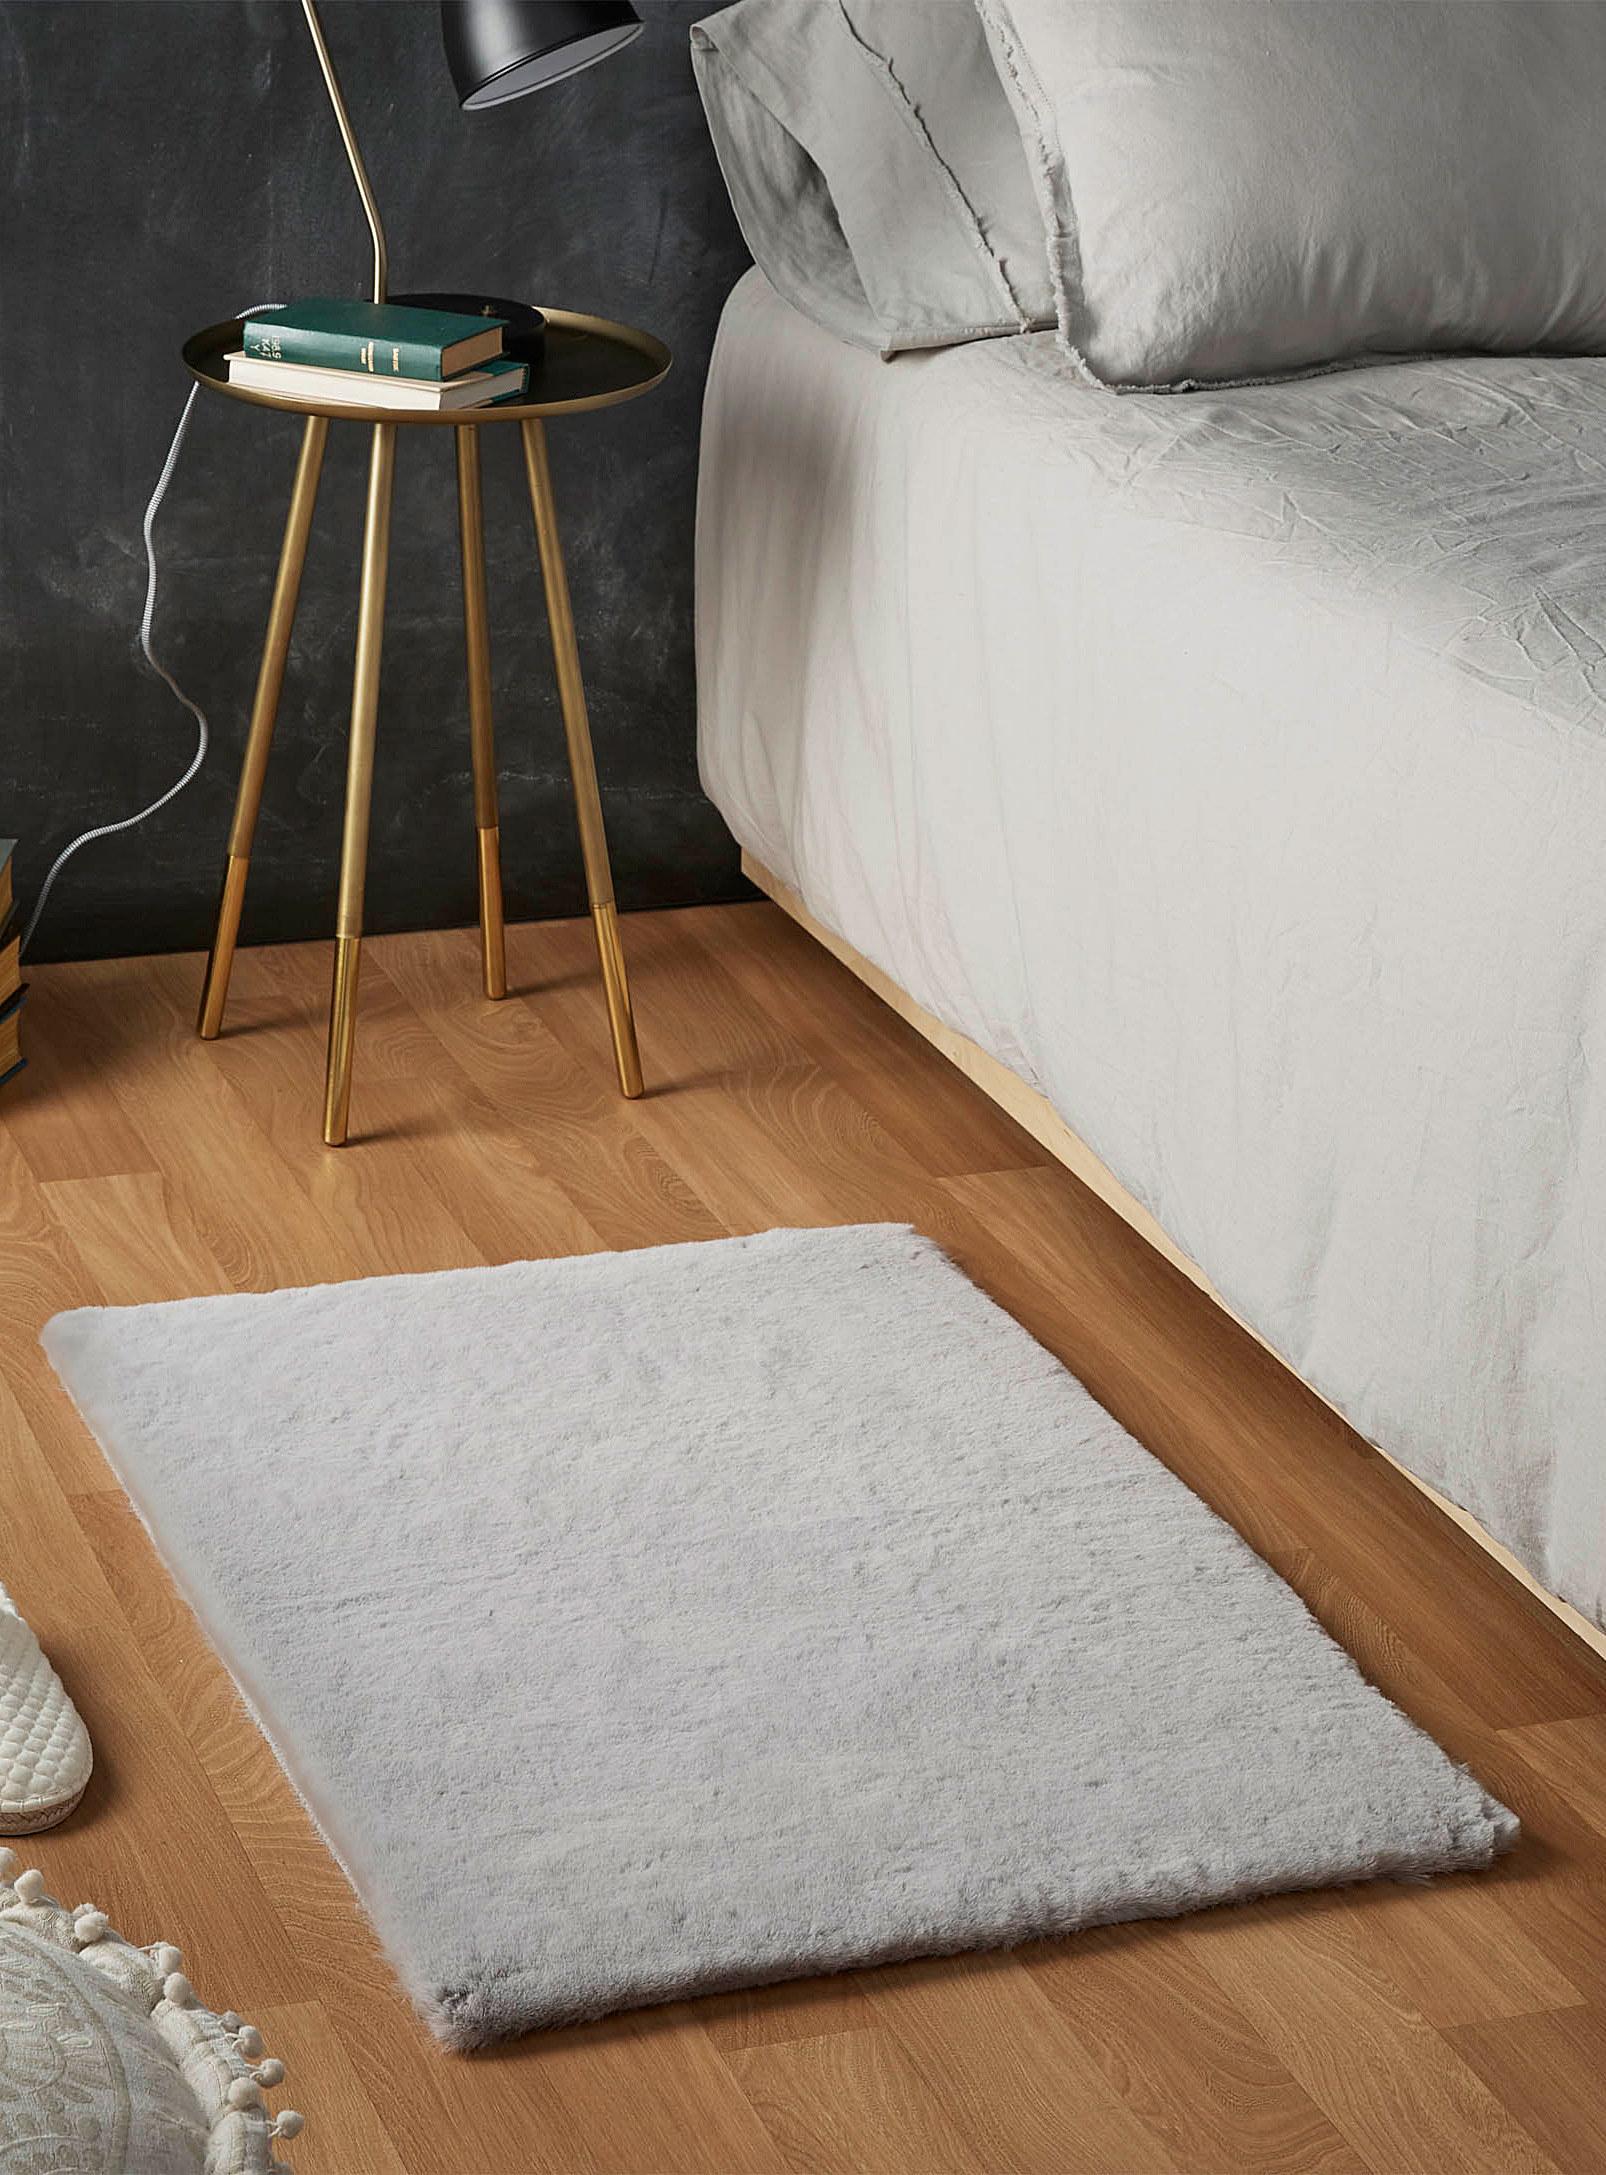 A faux fur rug on the floor near a bed